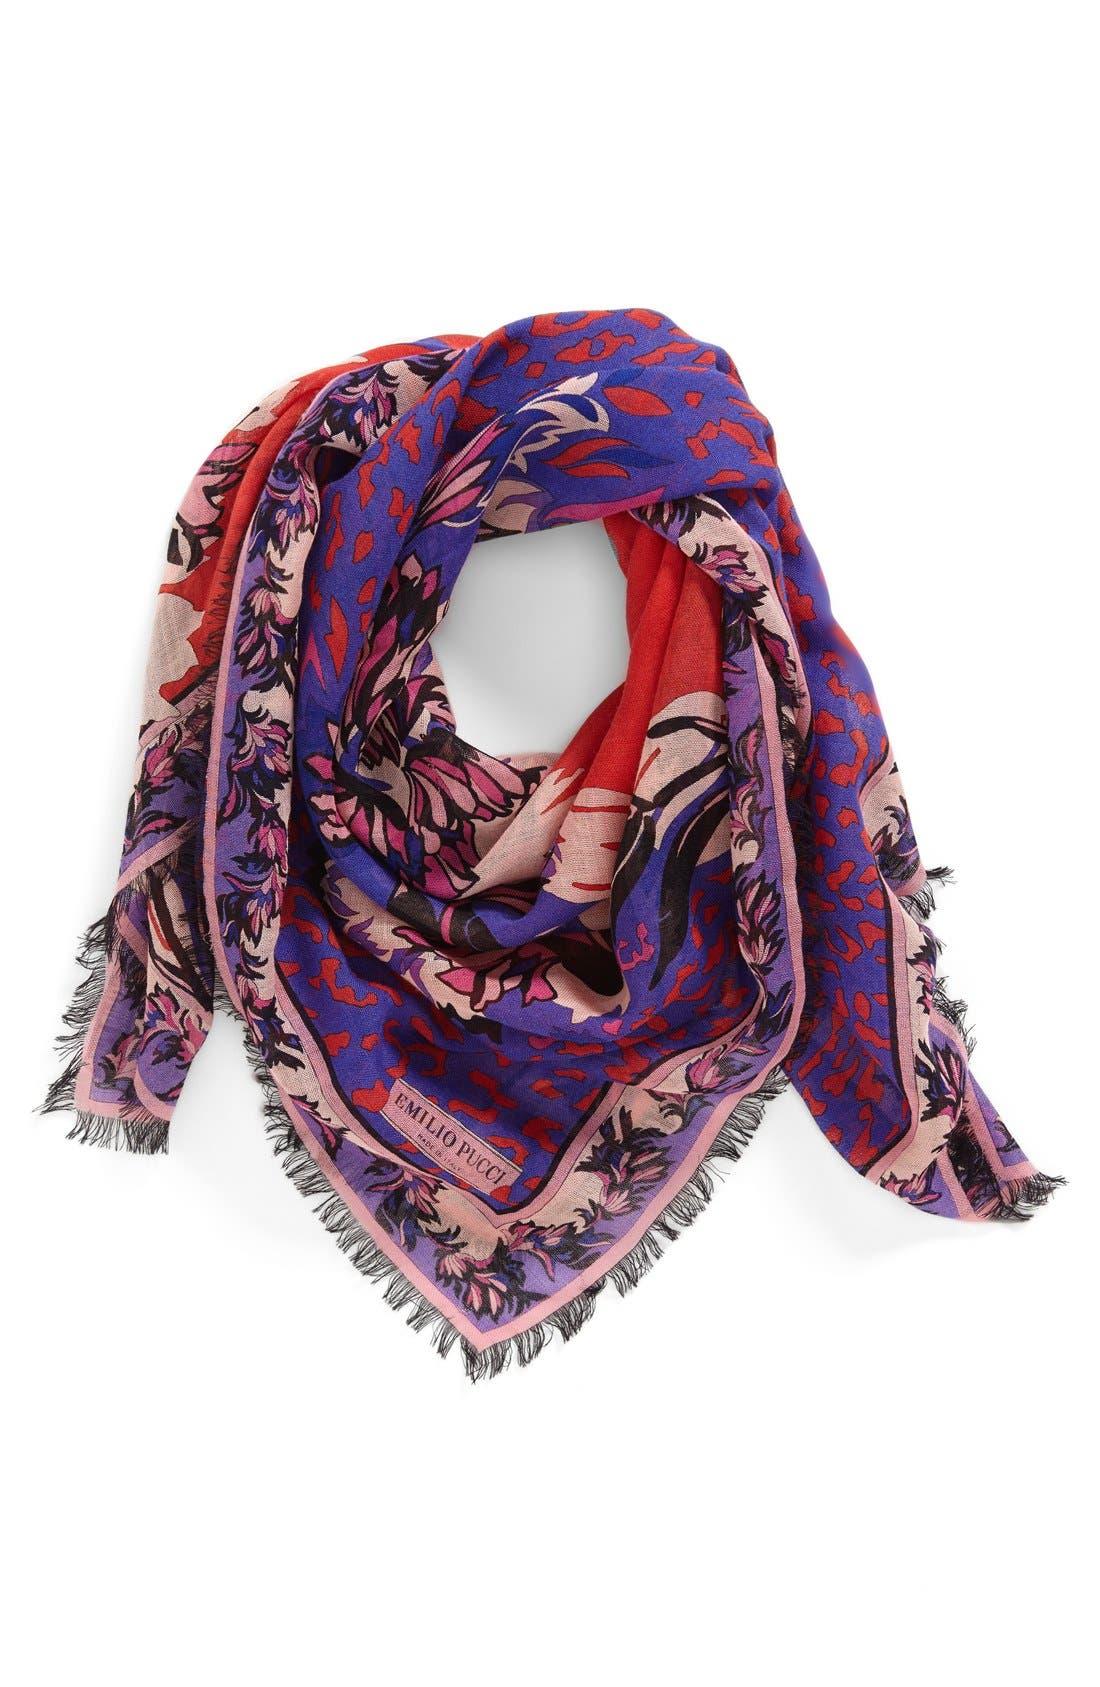 Alternate Image 1 Selected - Emilio Pucci 'Khiva' Wool & Silk Scarf